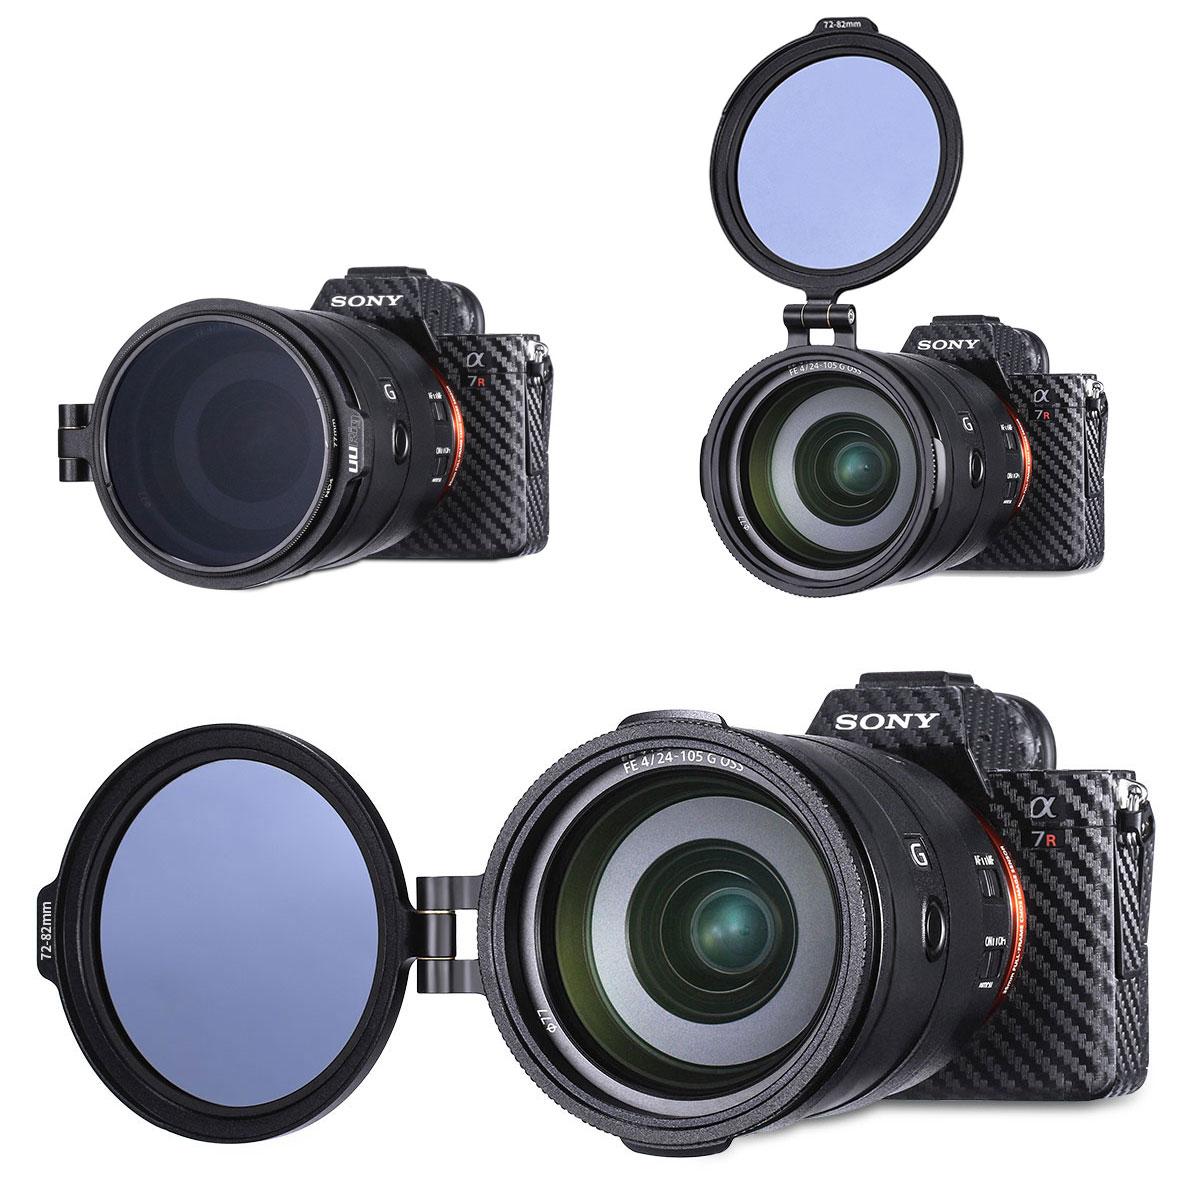 Redukcja do obiektywu na filtr 82mm